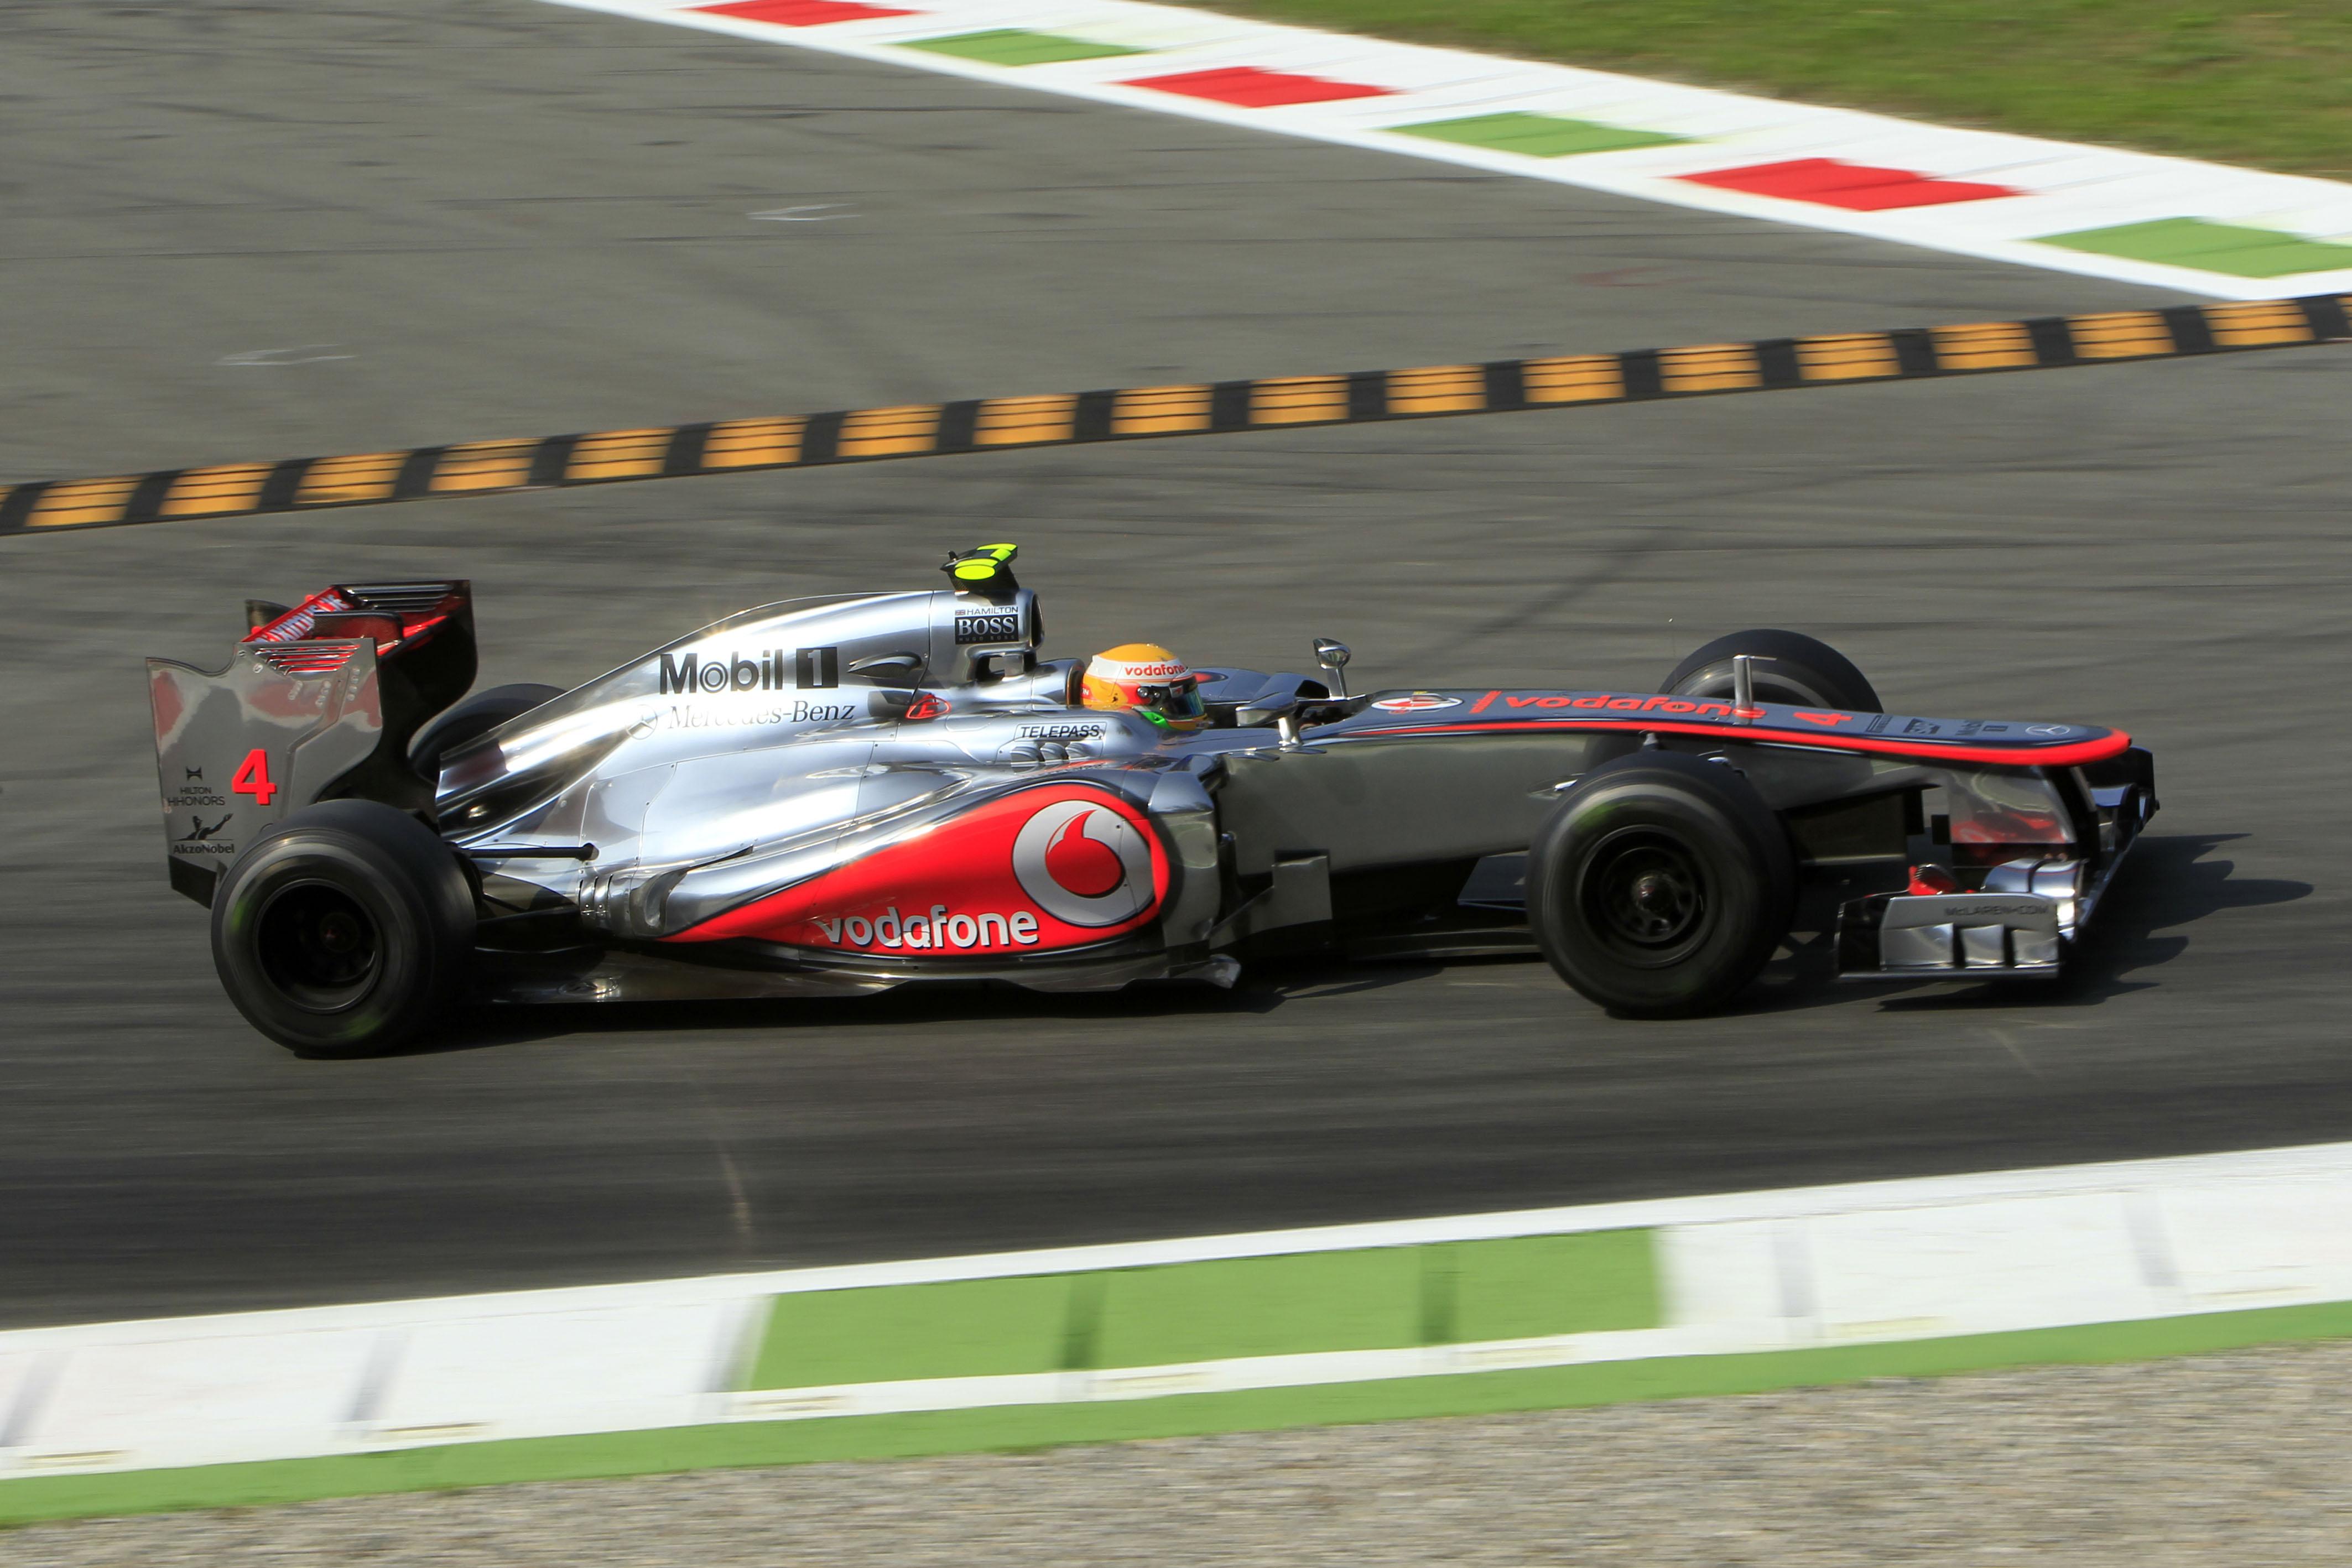 f1 – 2012 italian grand prix results – vodafone mclaren mercedes